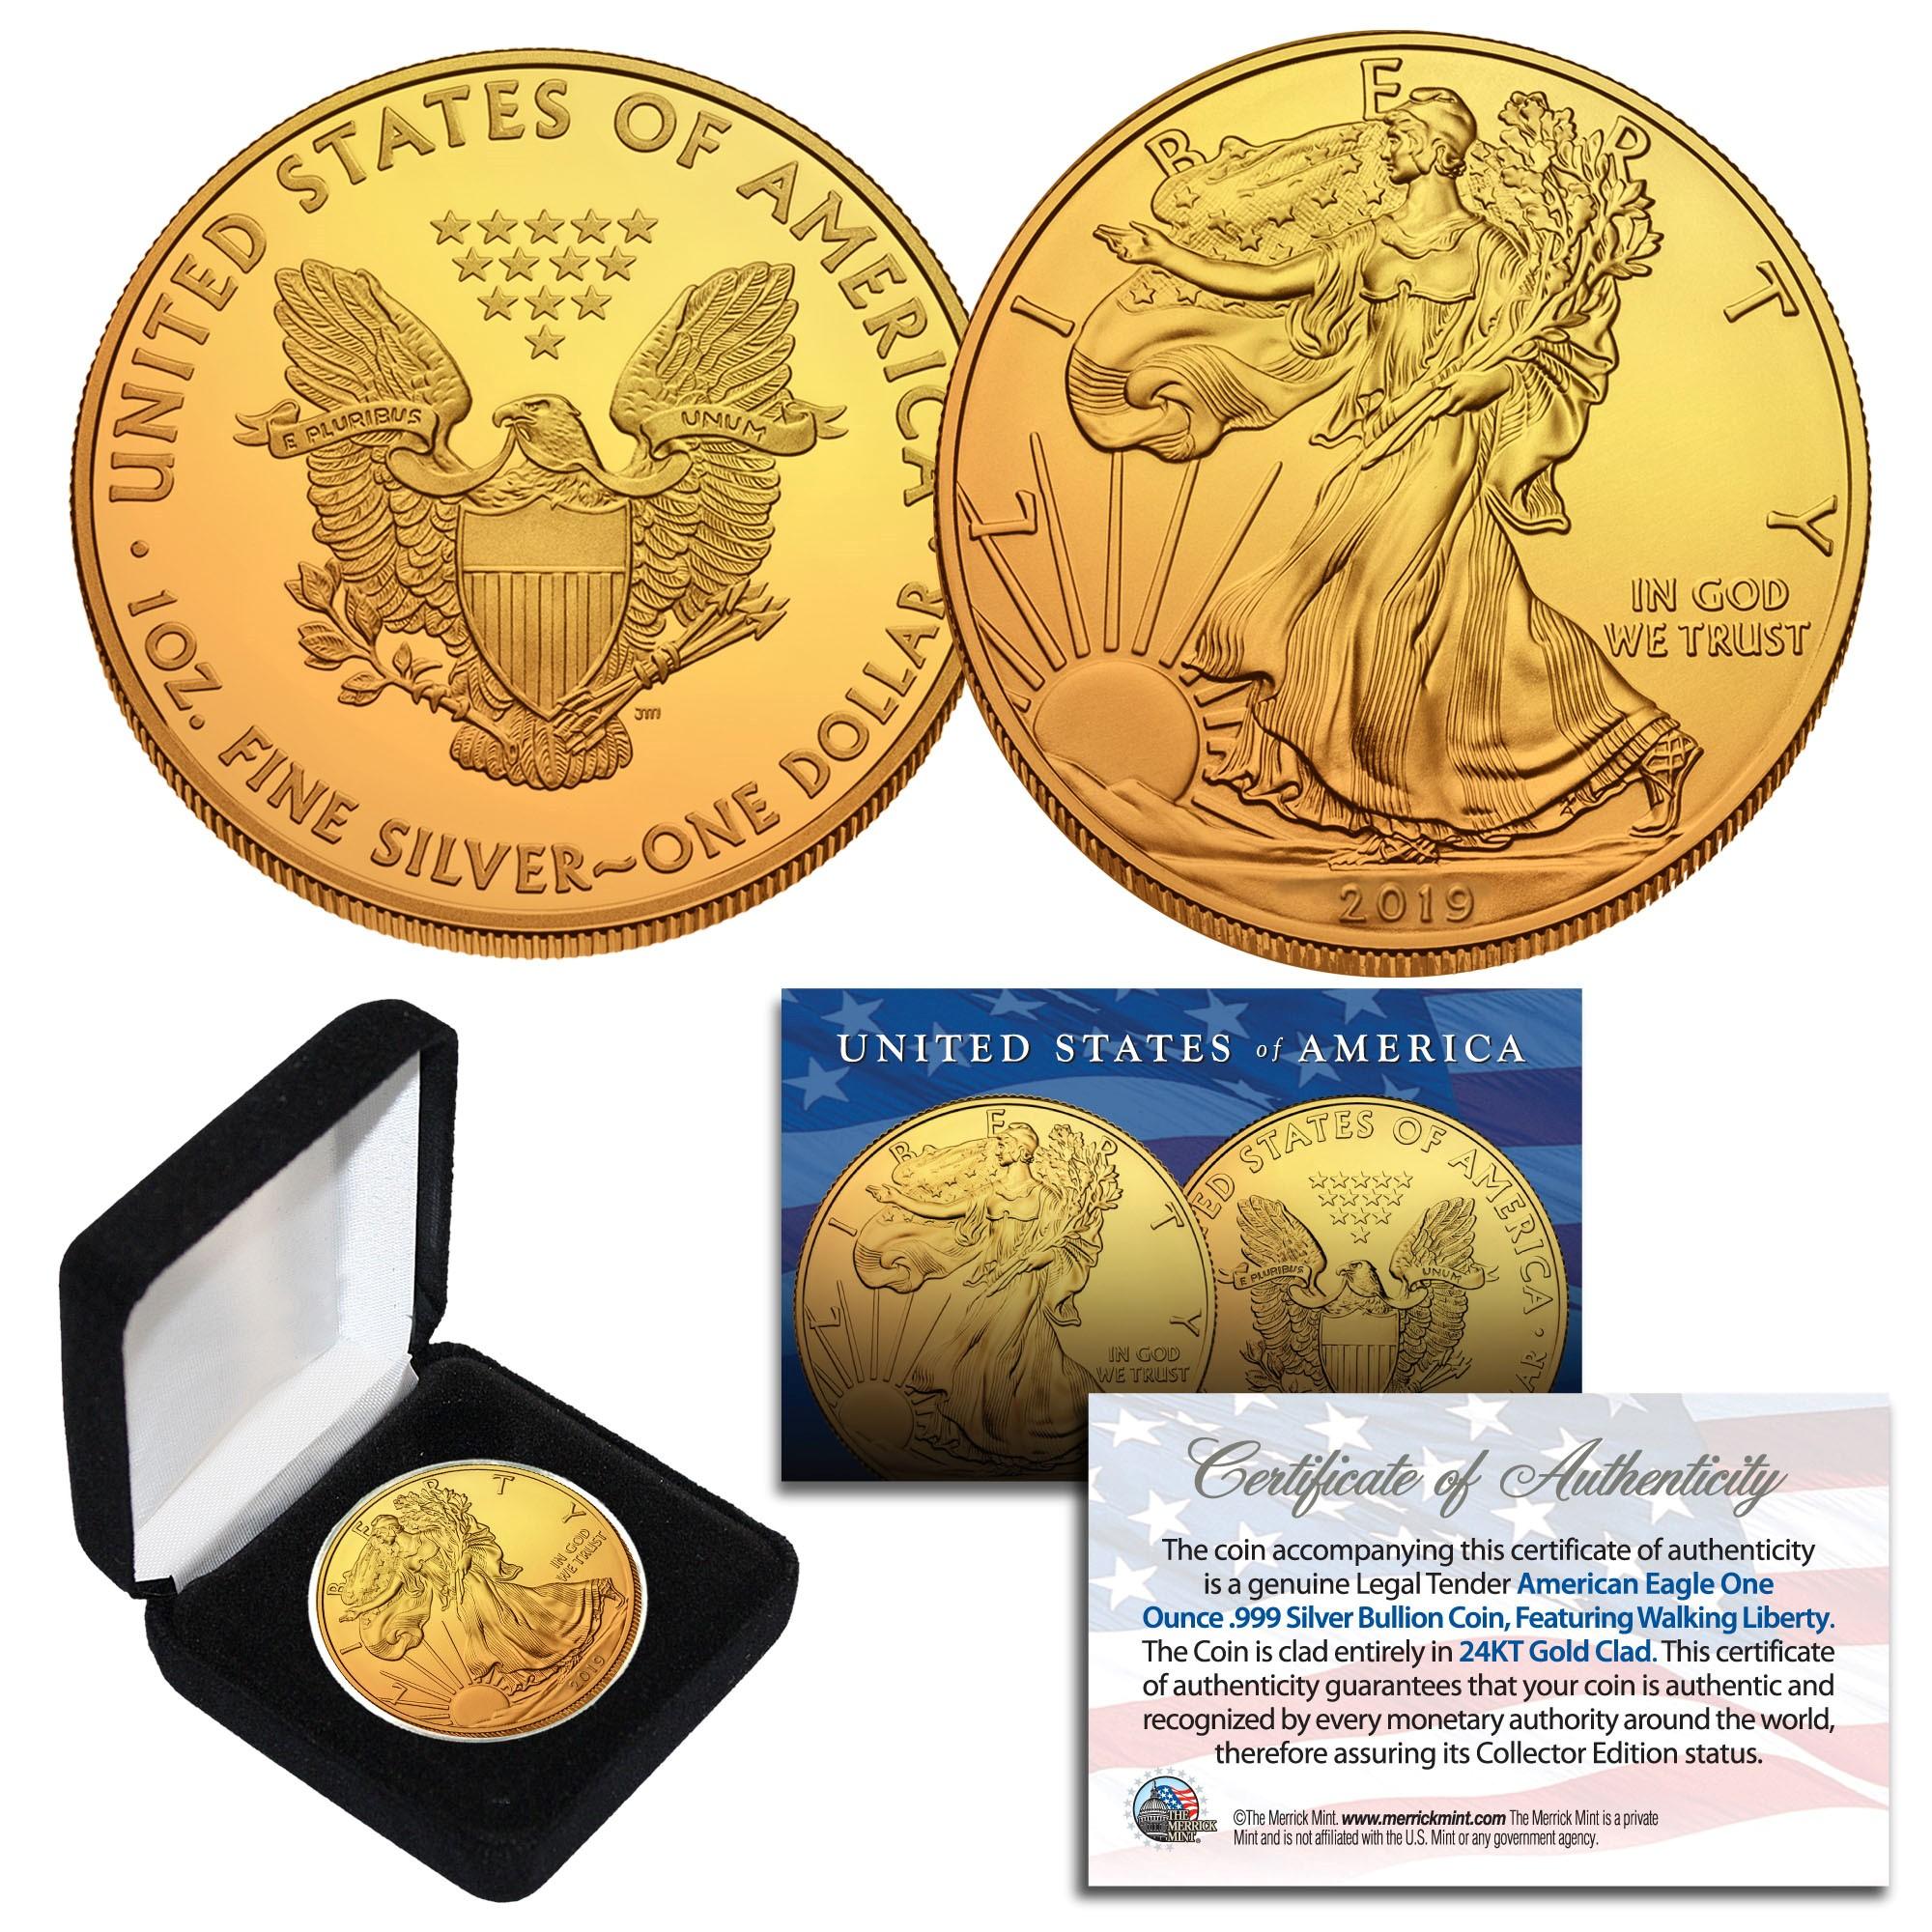 24K ROSE GOLD 2019 BLACK RUTHENIUM 1oz .999 Fine Silver American Eagle Coin